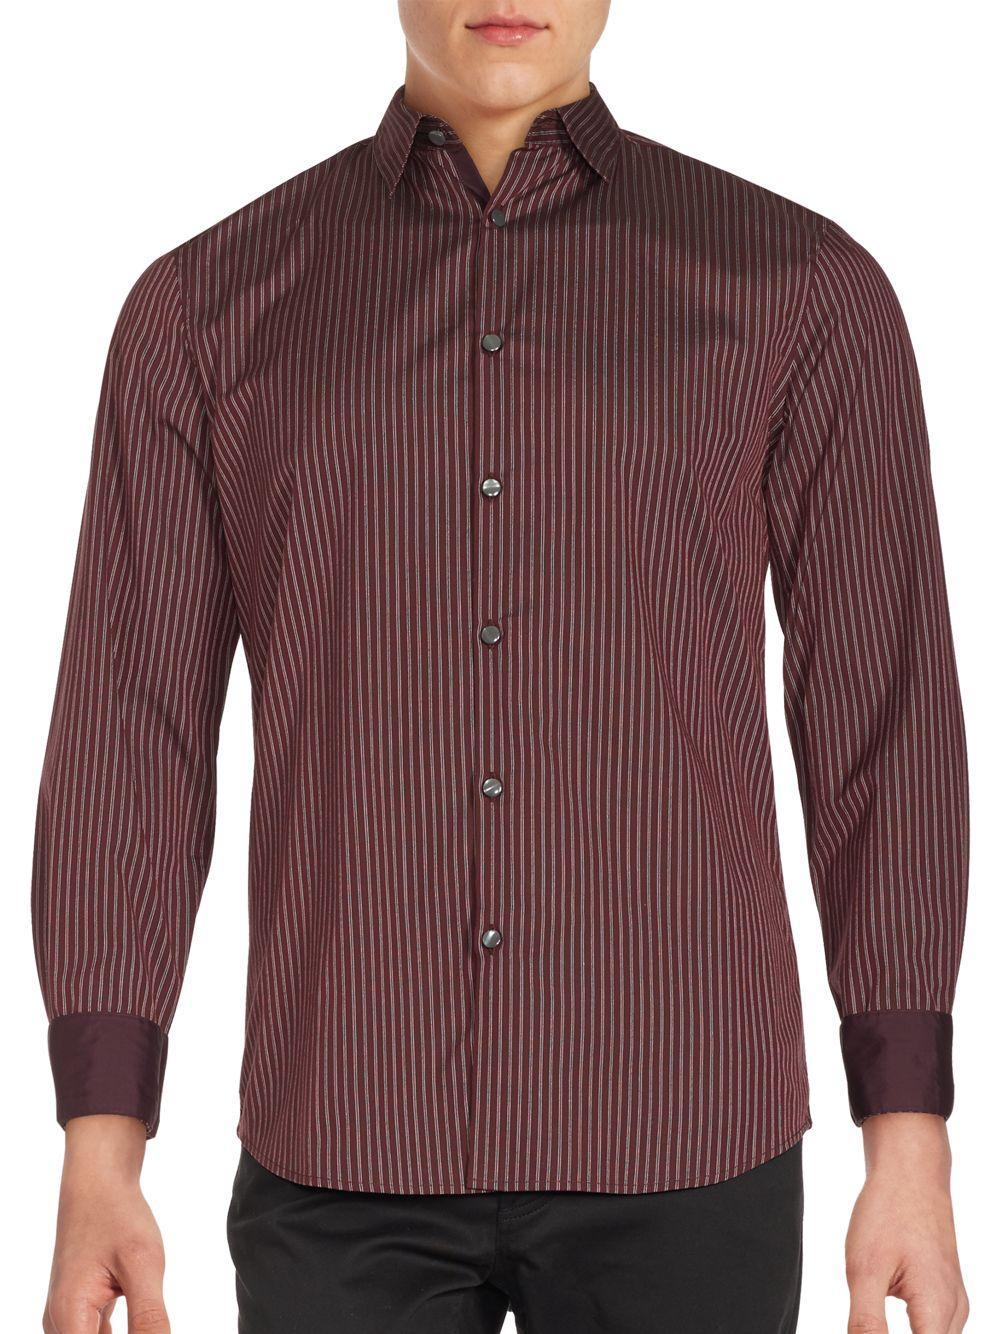 John varvatos striped cotton button down shirt in red for for Red and white striped button down shirt